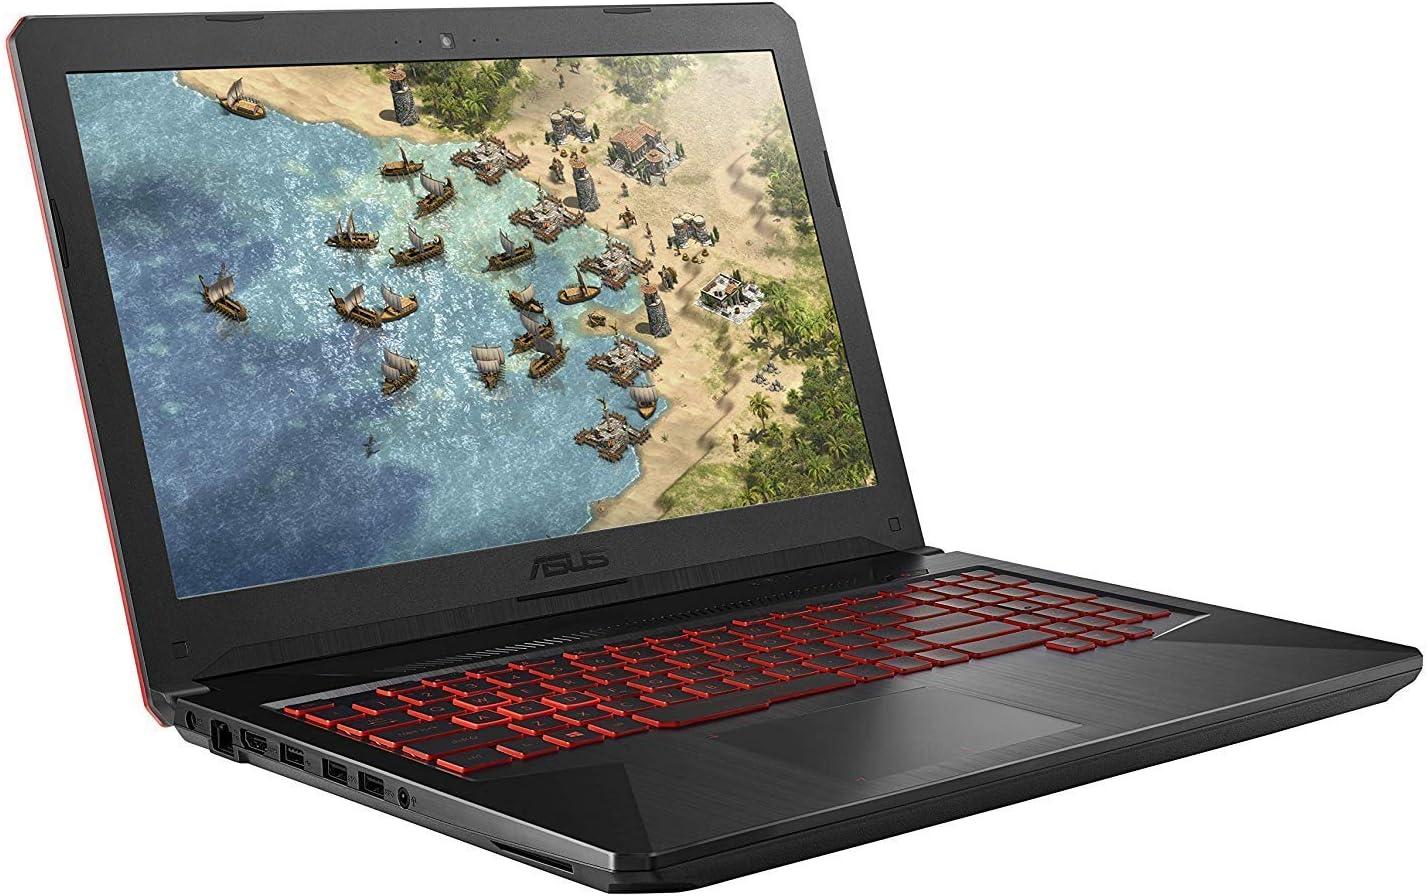 "2019 Asus TUF 15.6"" FHD VR Ready Gaming Laptop Computer, 8th Gen Intel Hexa-Core i7-8750H up to 4.10GHz, 16GB DDR4, 256GB SSD + 1TB HDD, GTX 1050 Ti, 802.11ac WiFi, HDMI, Backlit Keyboard, Windows 10"